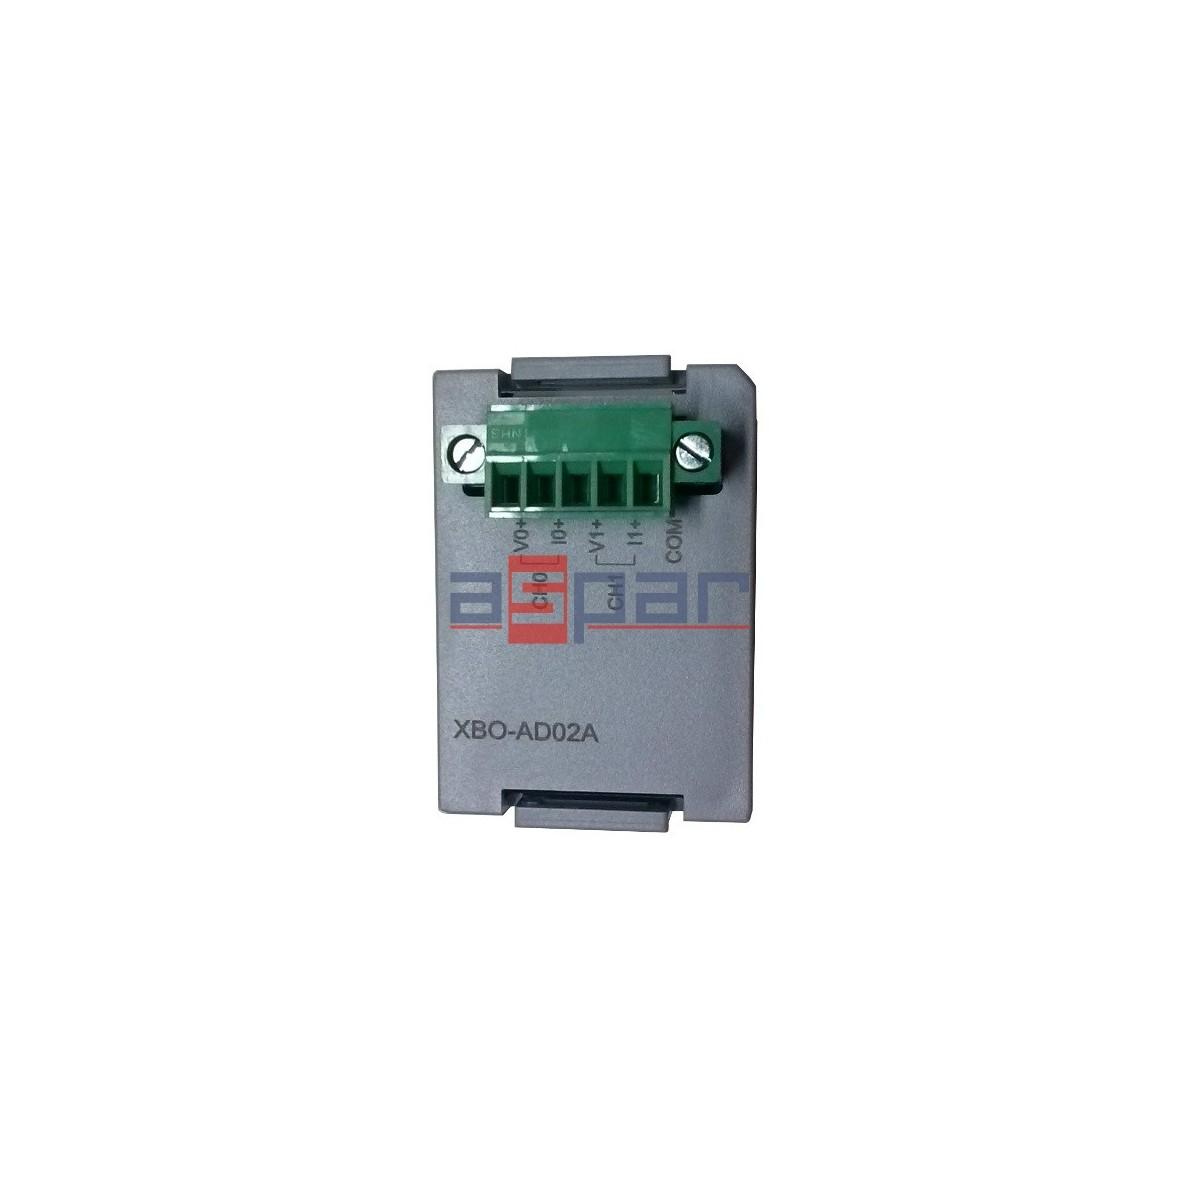 XBO-DC04A - 4 digital inputs